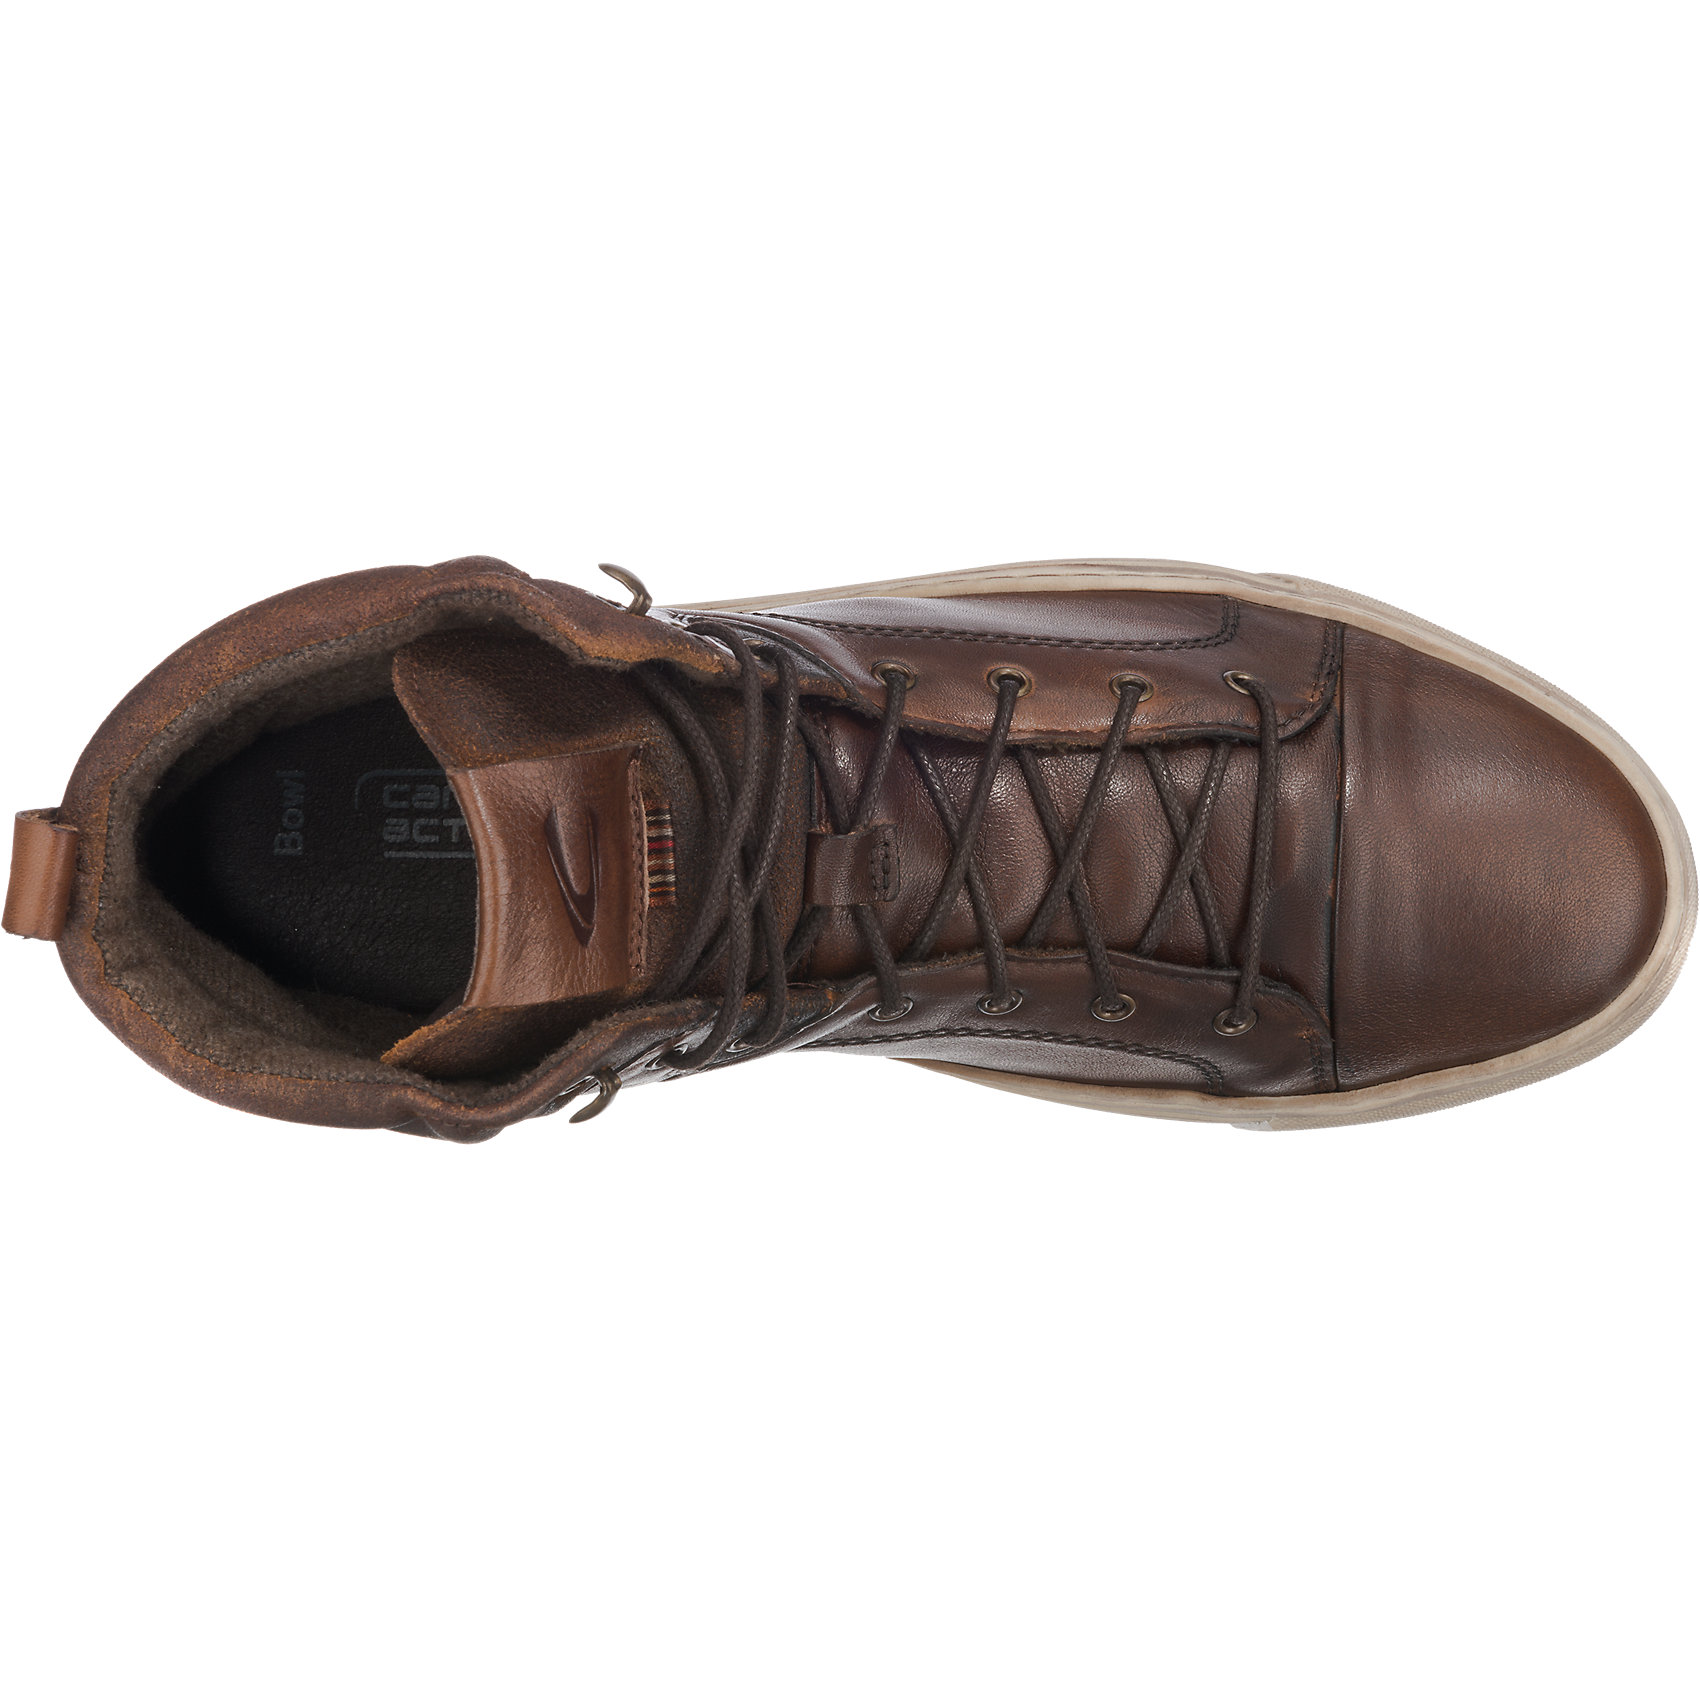 Details zu Neu camel active Bowl 32 Sneakers braun 5778065